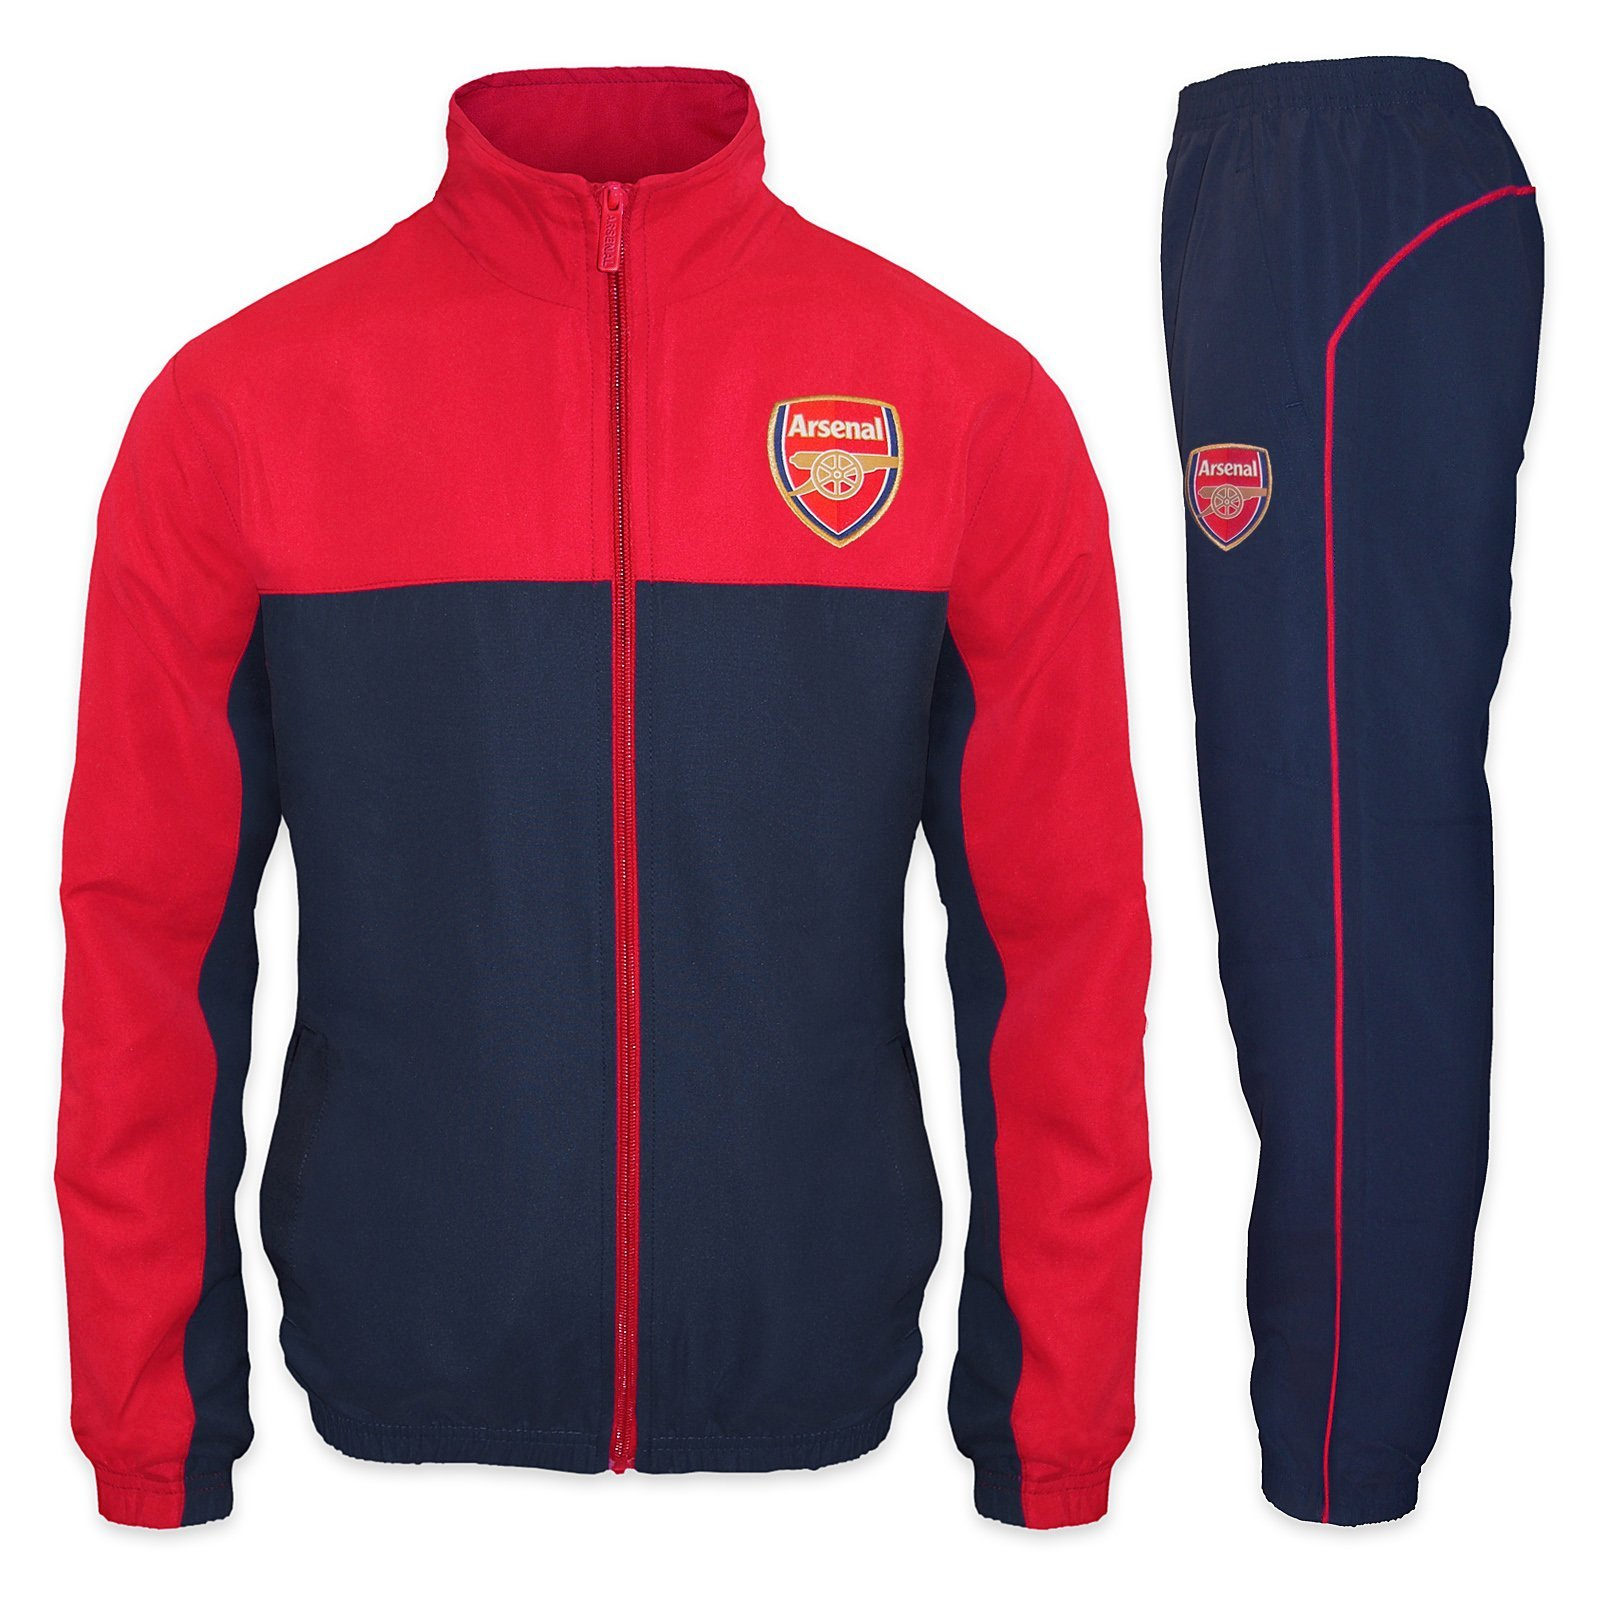 Arsenal FC Official Soccer Gift Mens Jacket & Pants Tracksuit Set XL